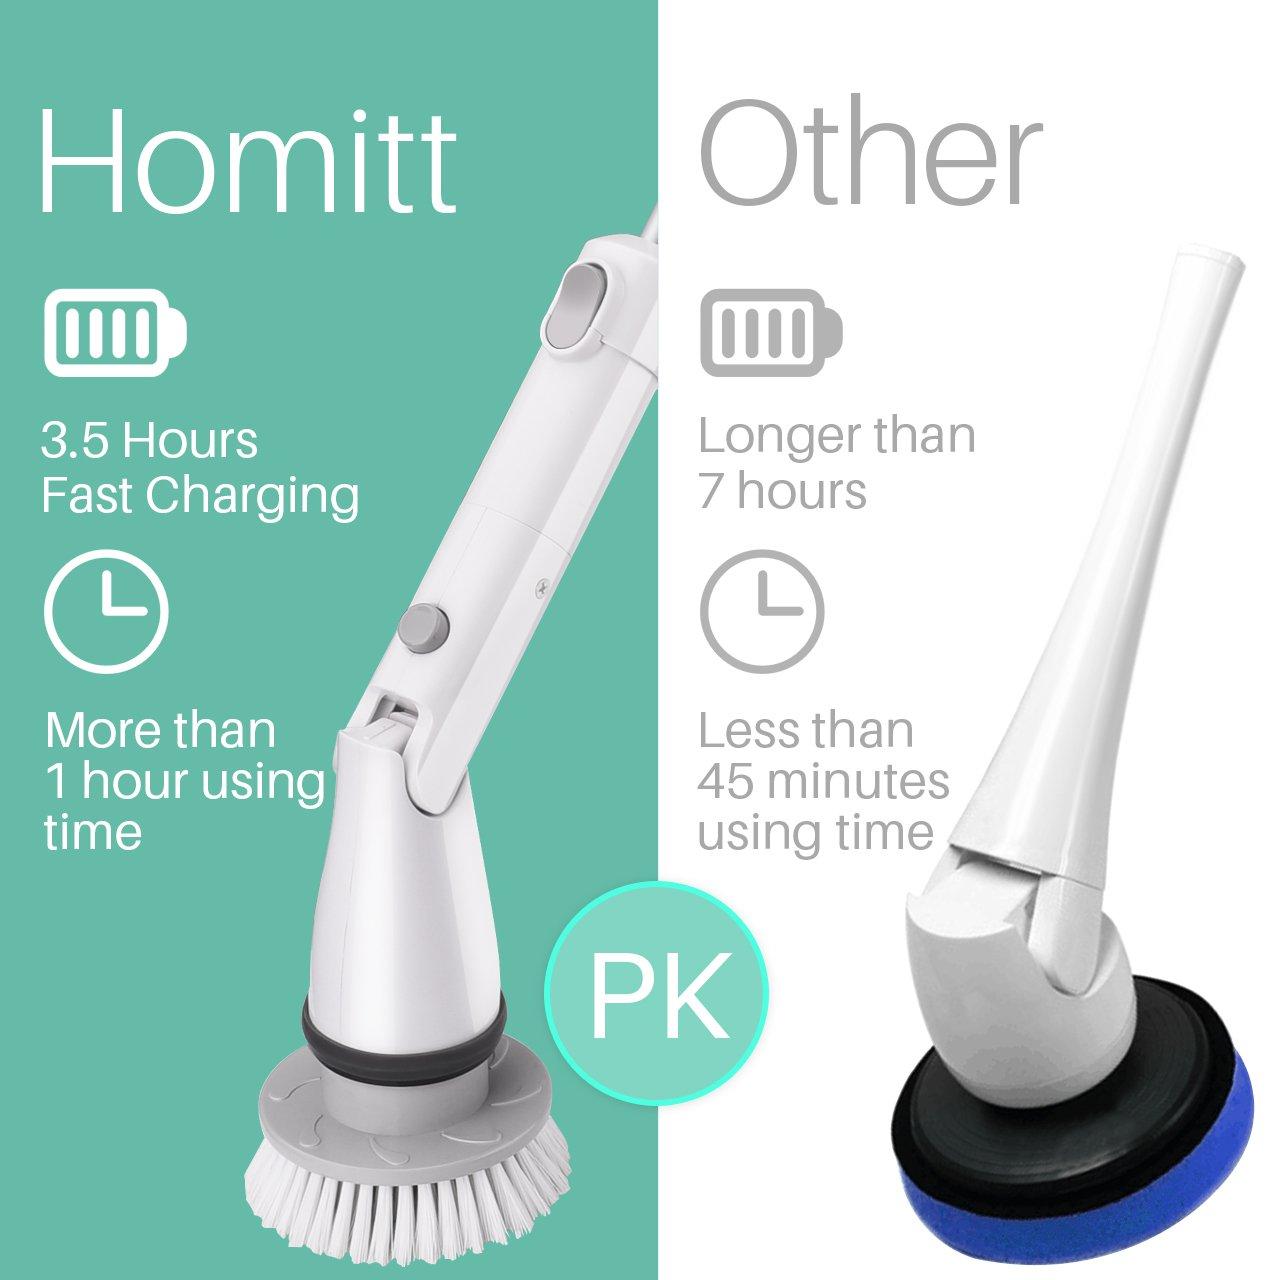 Amazon.com: Homitt Electric Spin Scrubber, 360 Cordless Bathroom ...